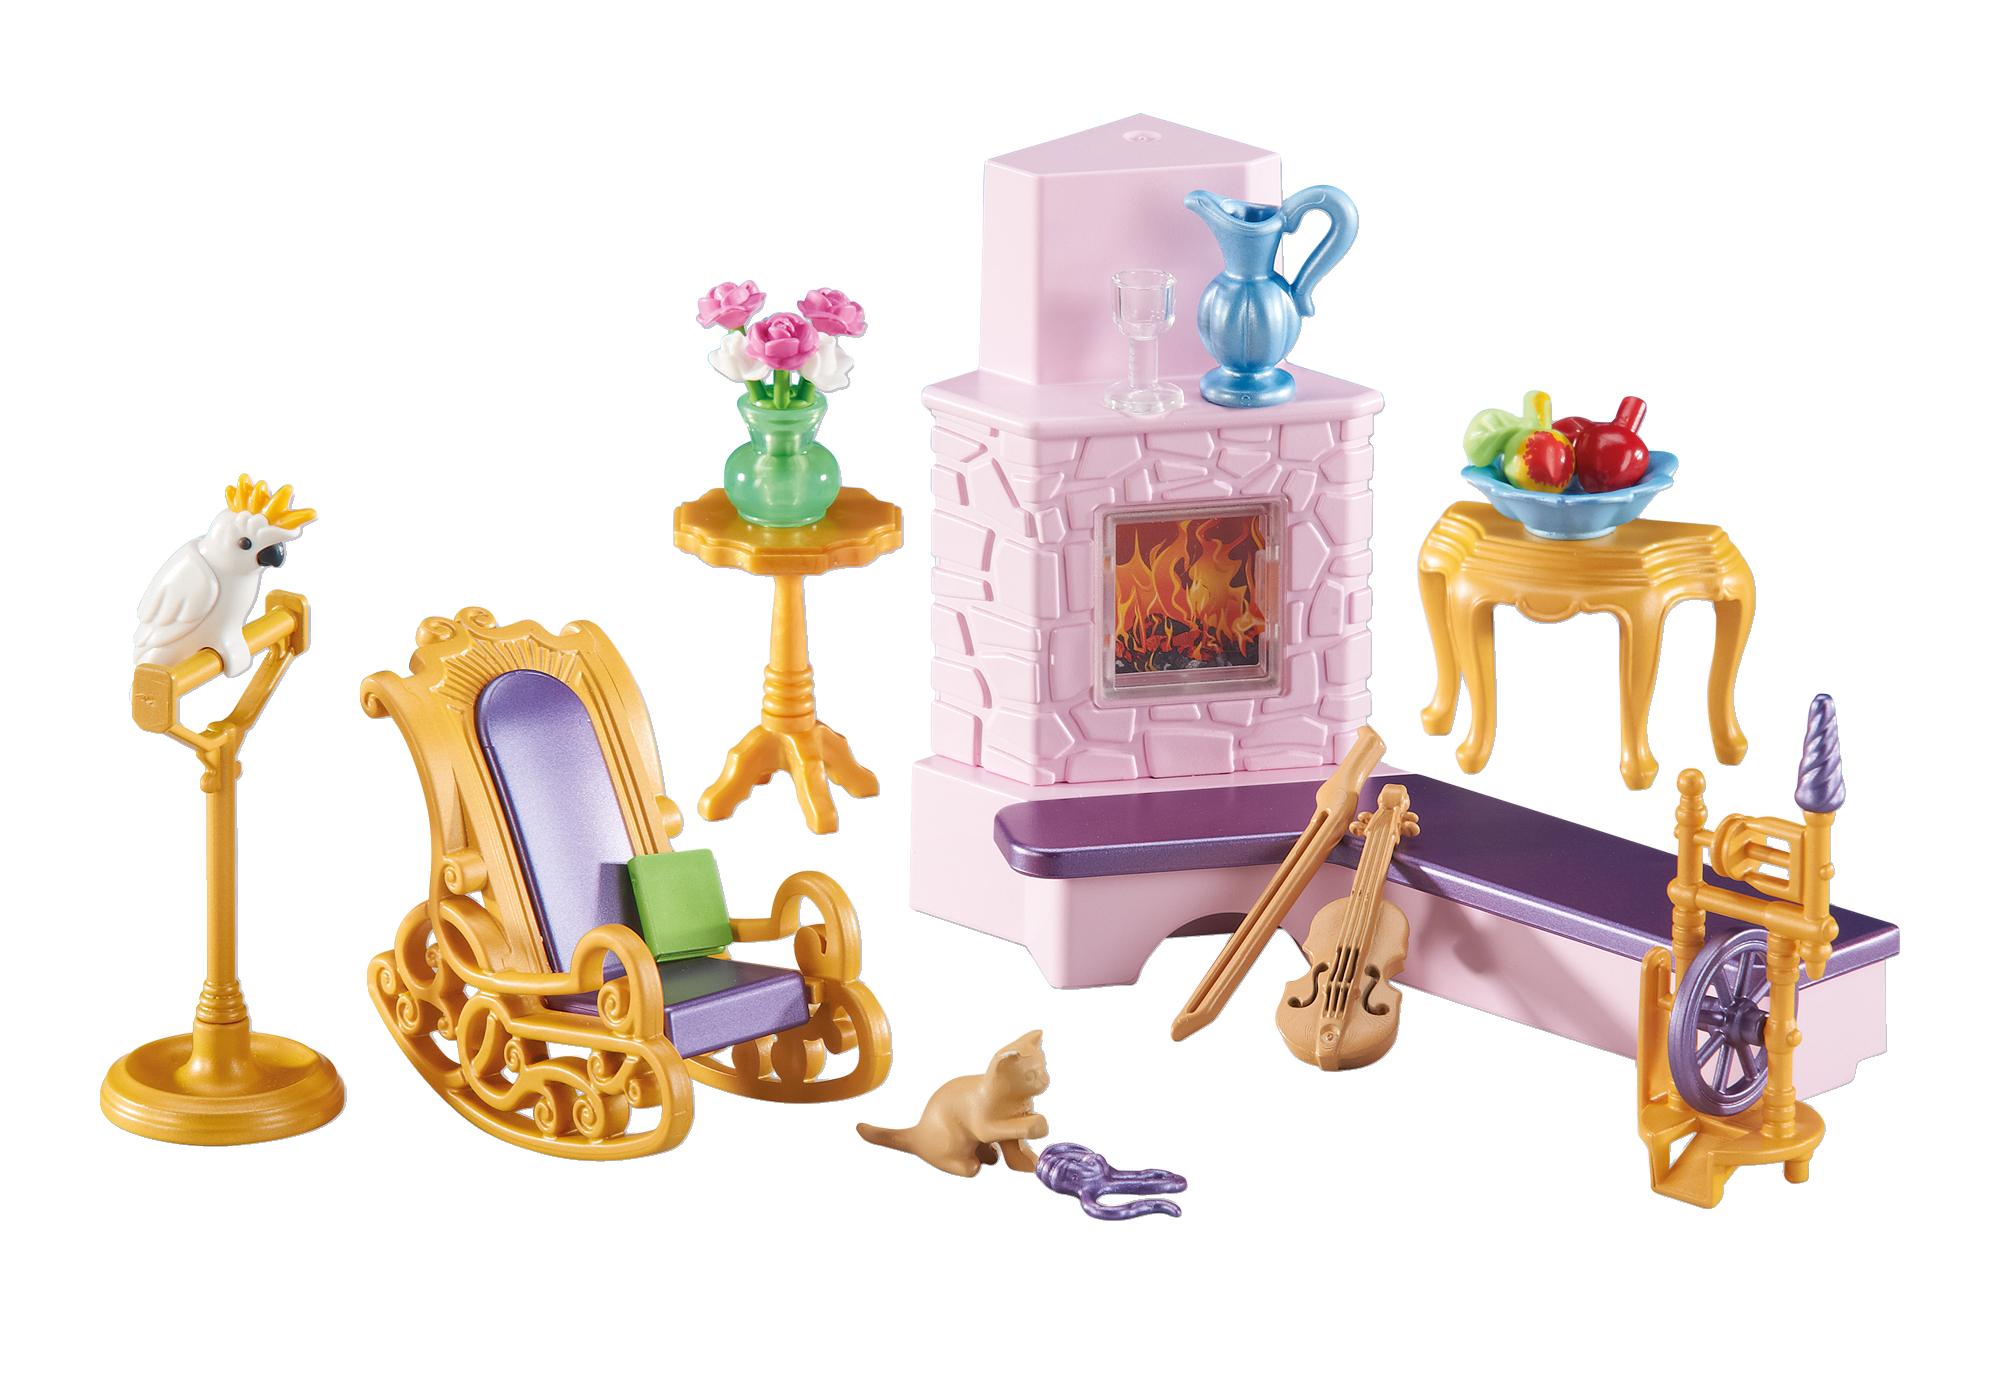 http://media.playmobil.com/i/playmobil/6520_product_detail/Έπιπλα για βασιλικό σαλόνι